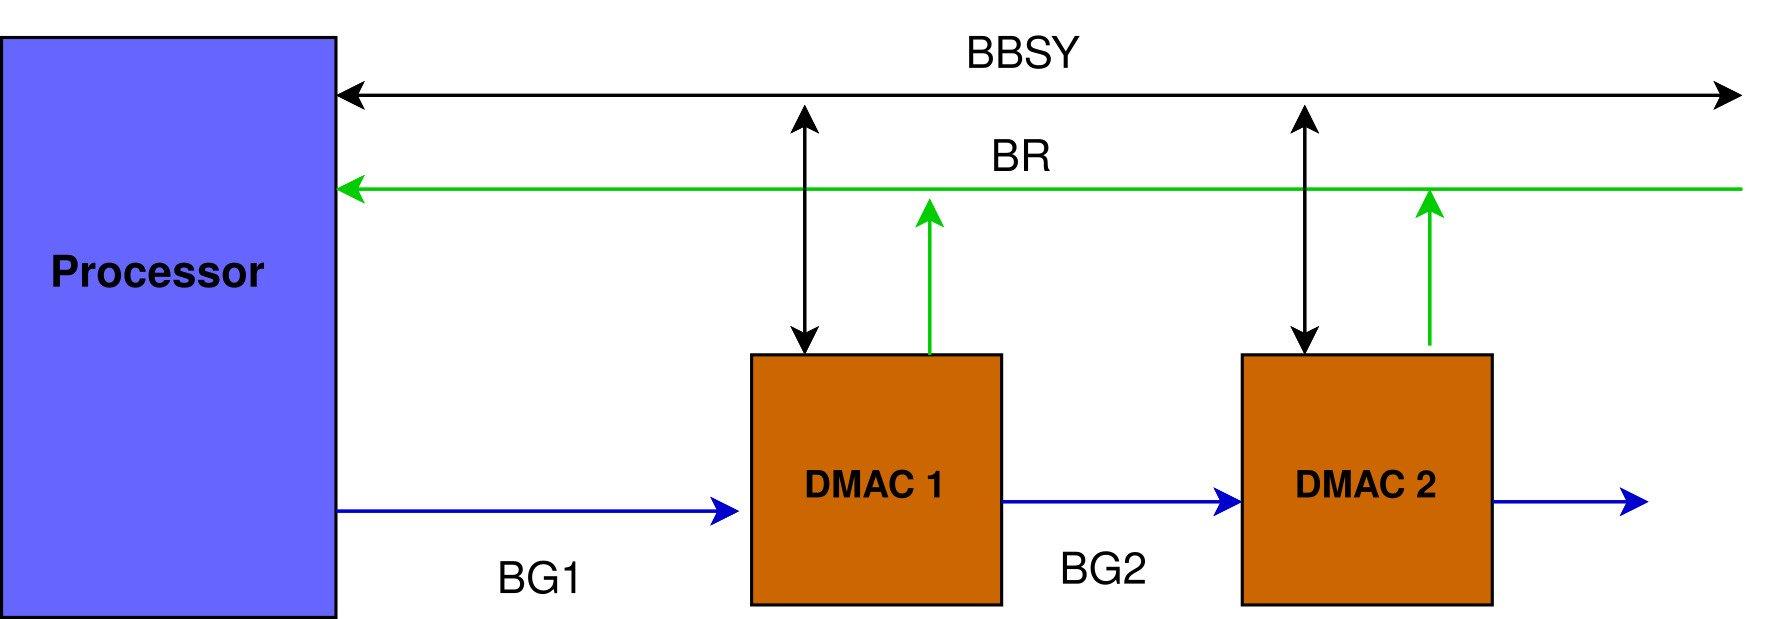 DMA Central arbitration